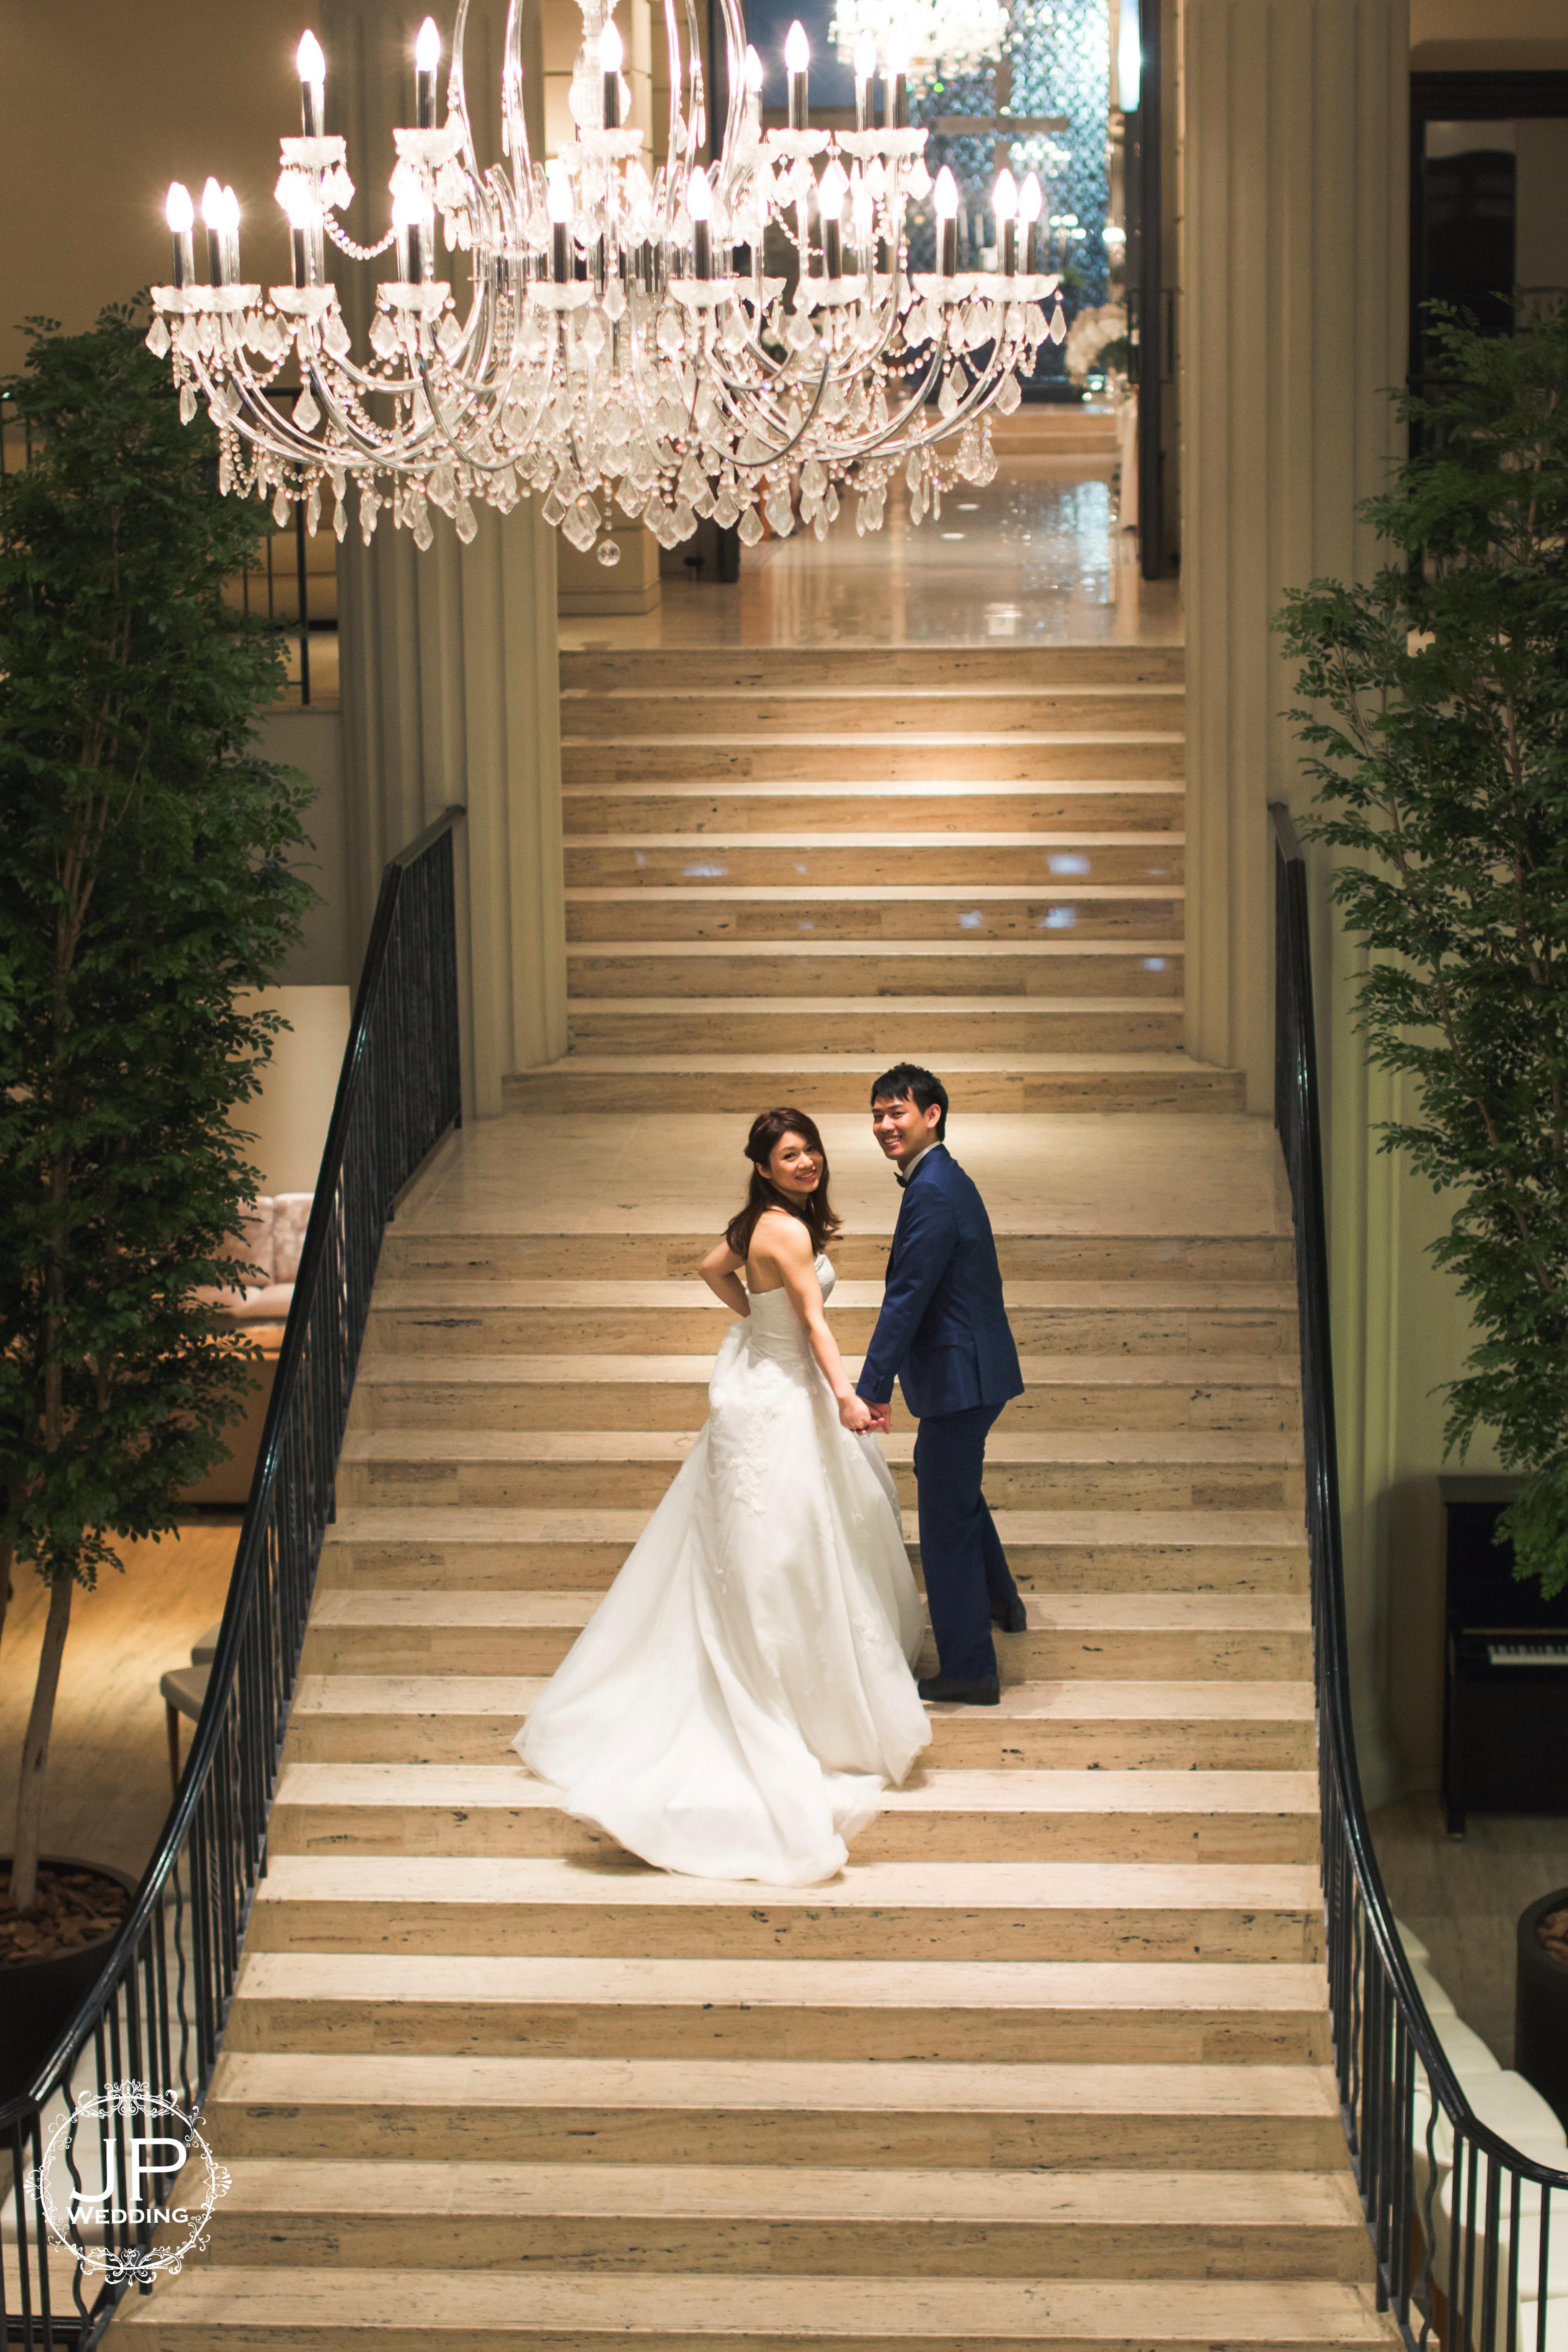 JP Wedding香港日本婚紗攝影-6